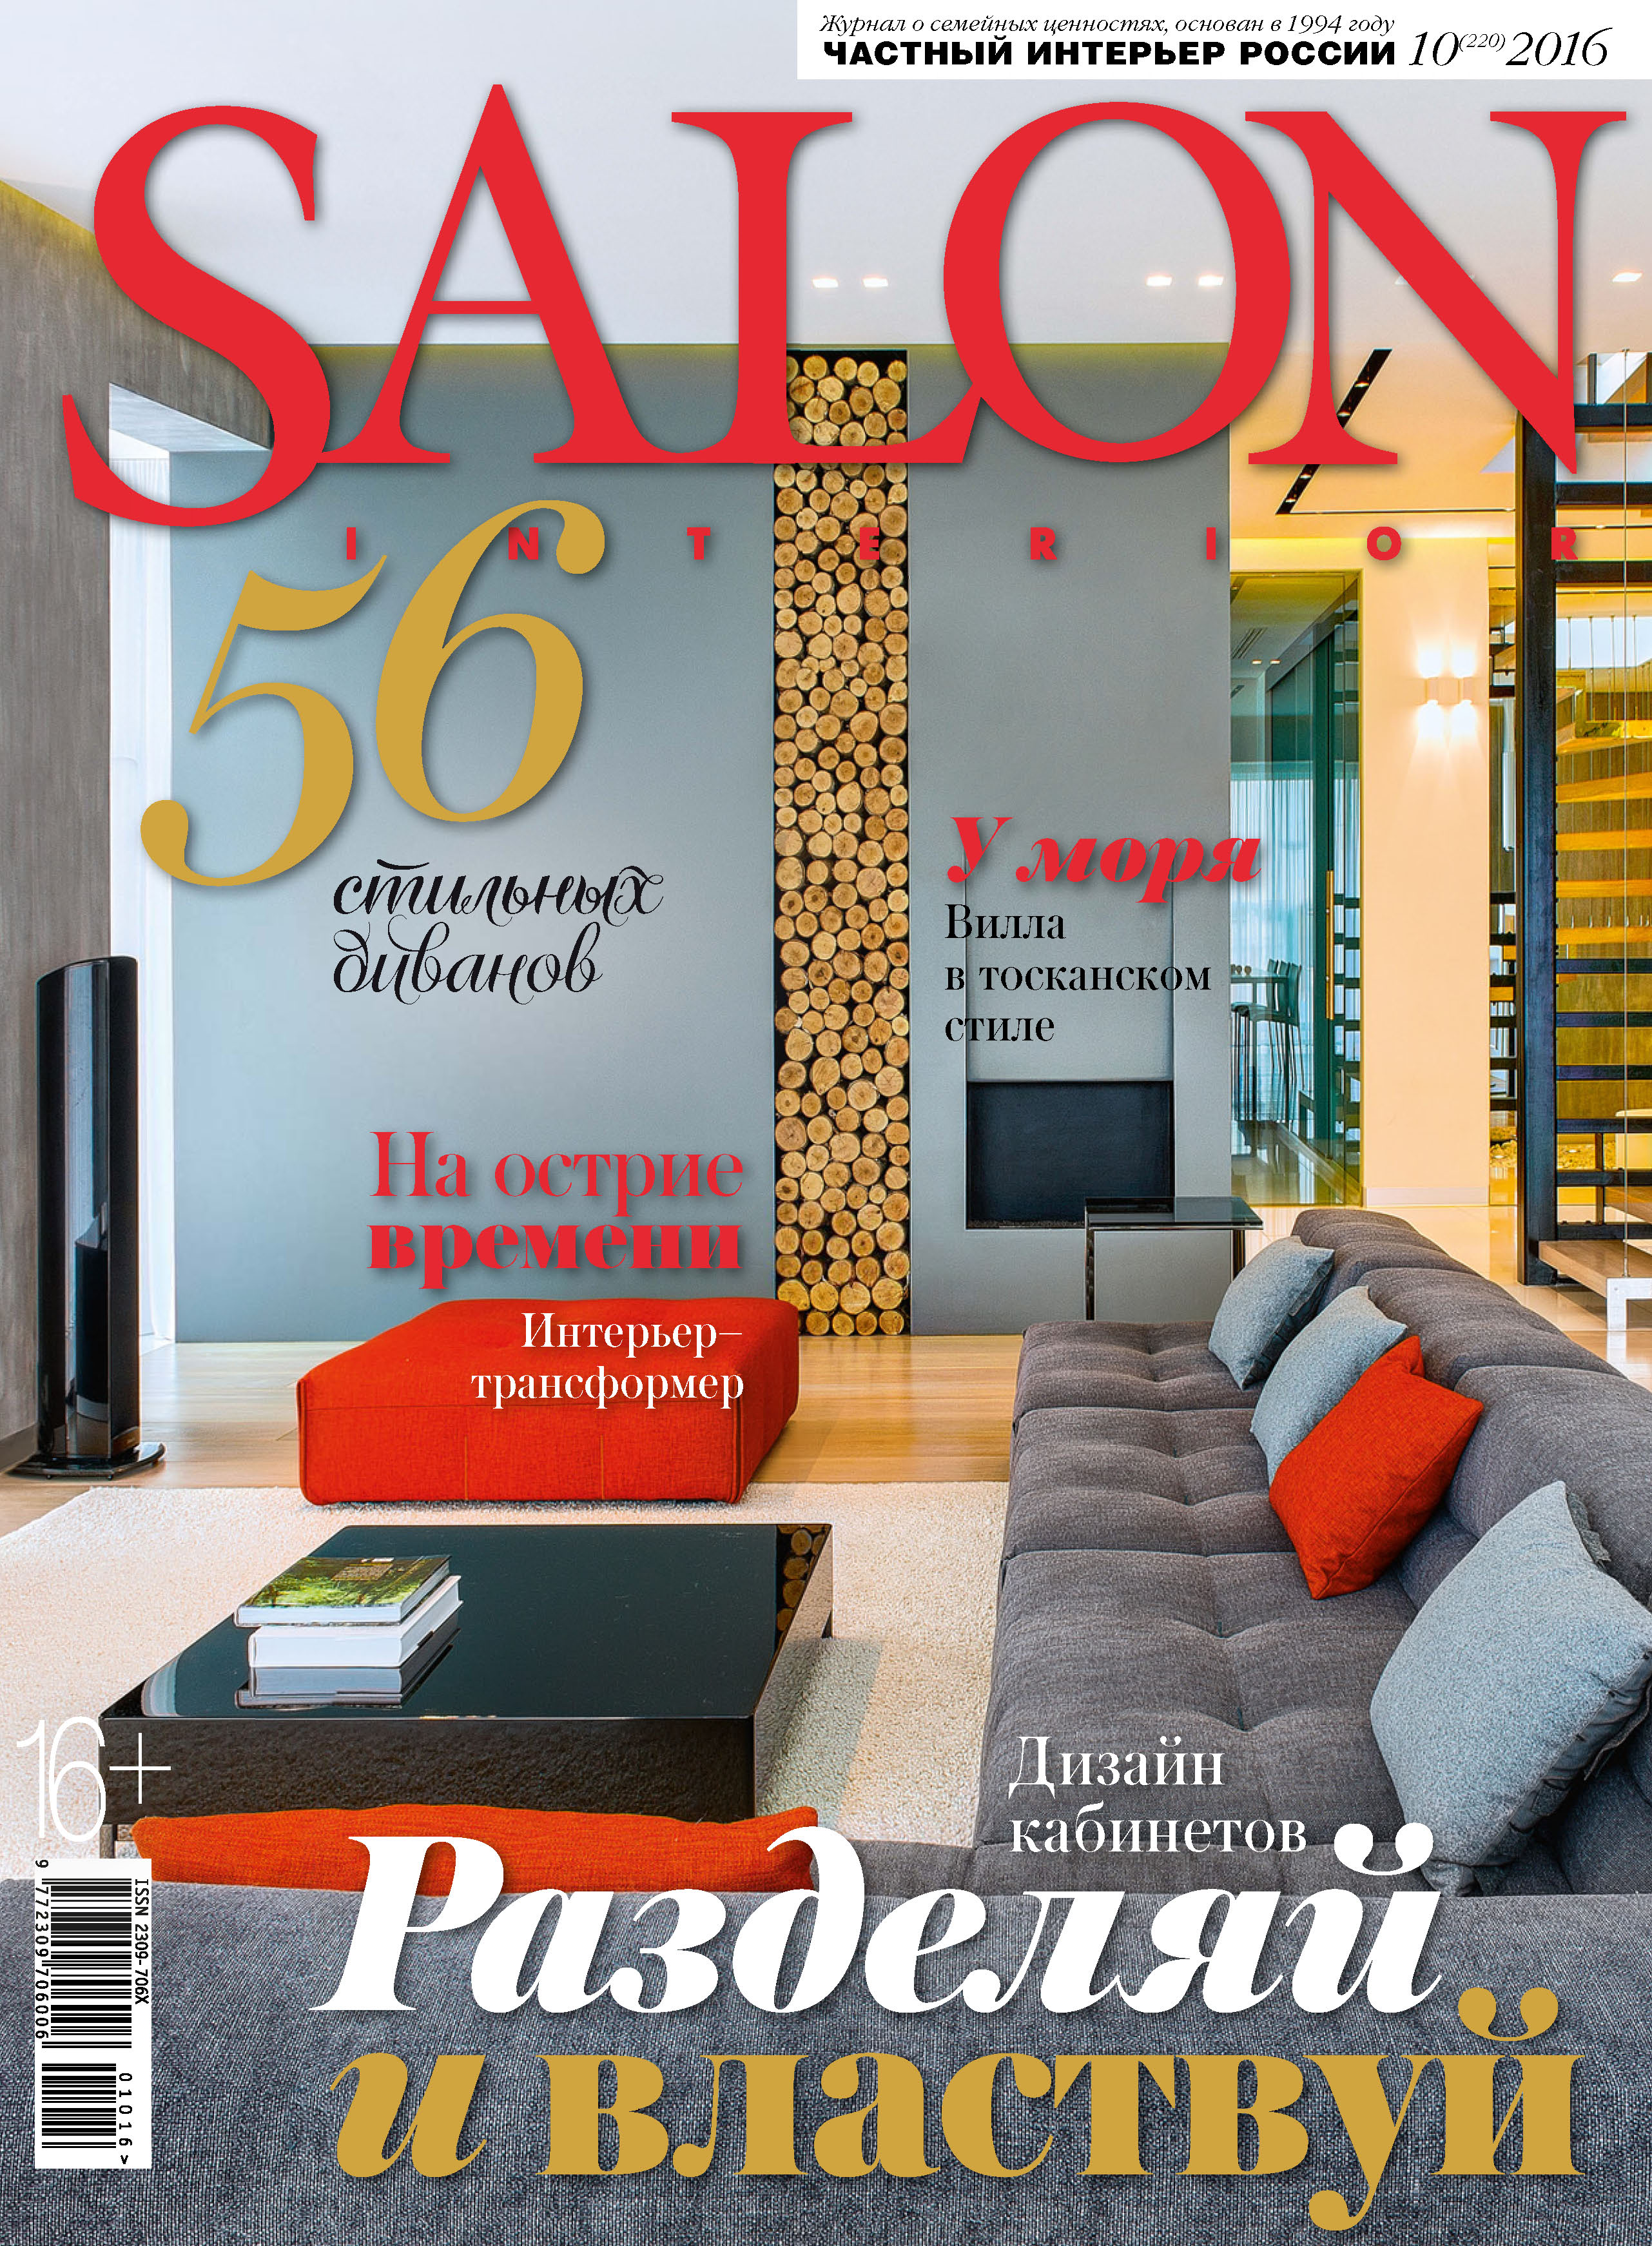 SALON-interior№10/2016